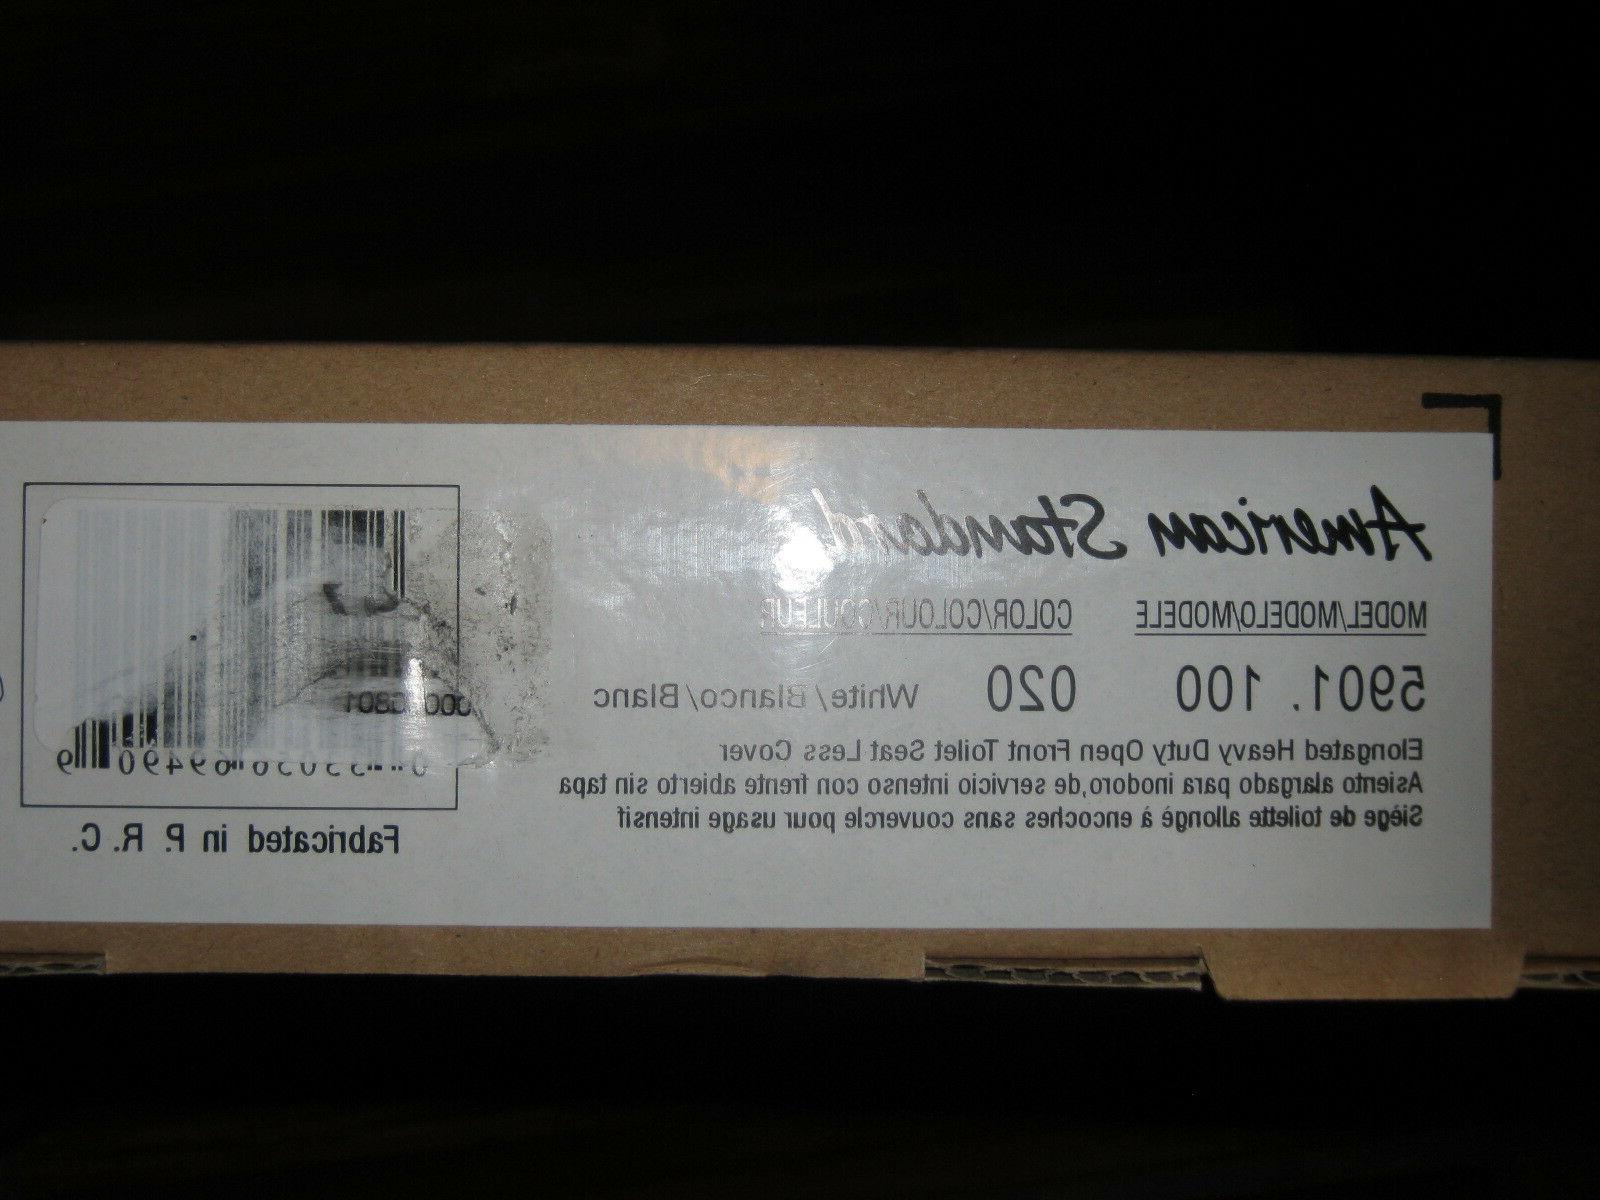 American Standard 5901.100.020 Heavy-Duty Elongated Commerci